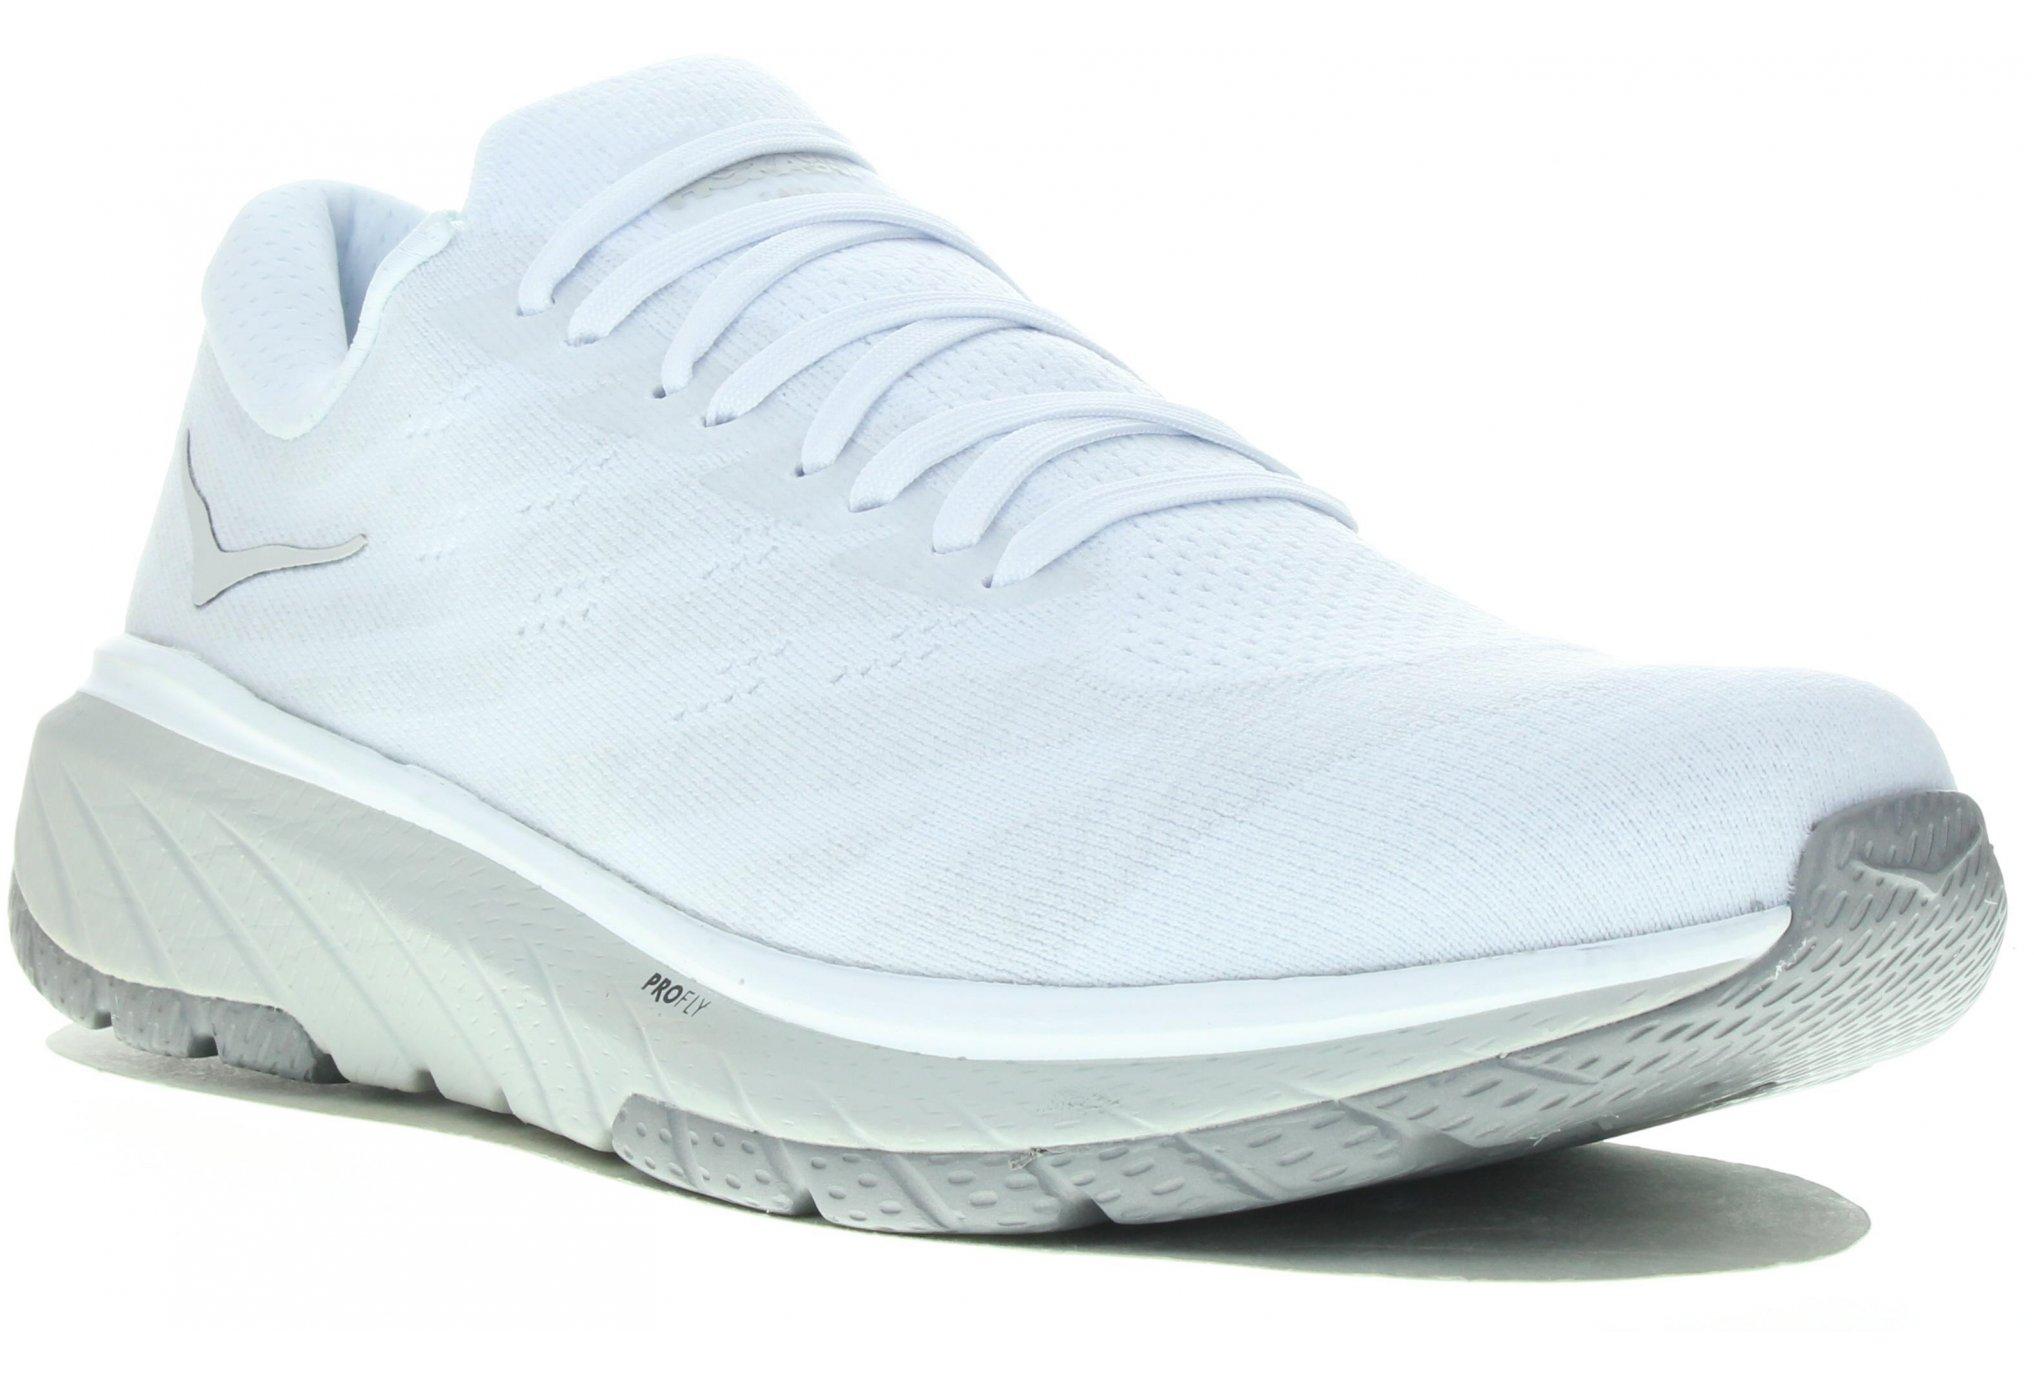 Hoka One One Cavu 3 Chaussures homme